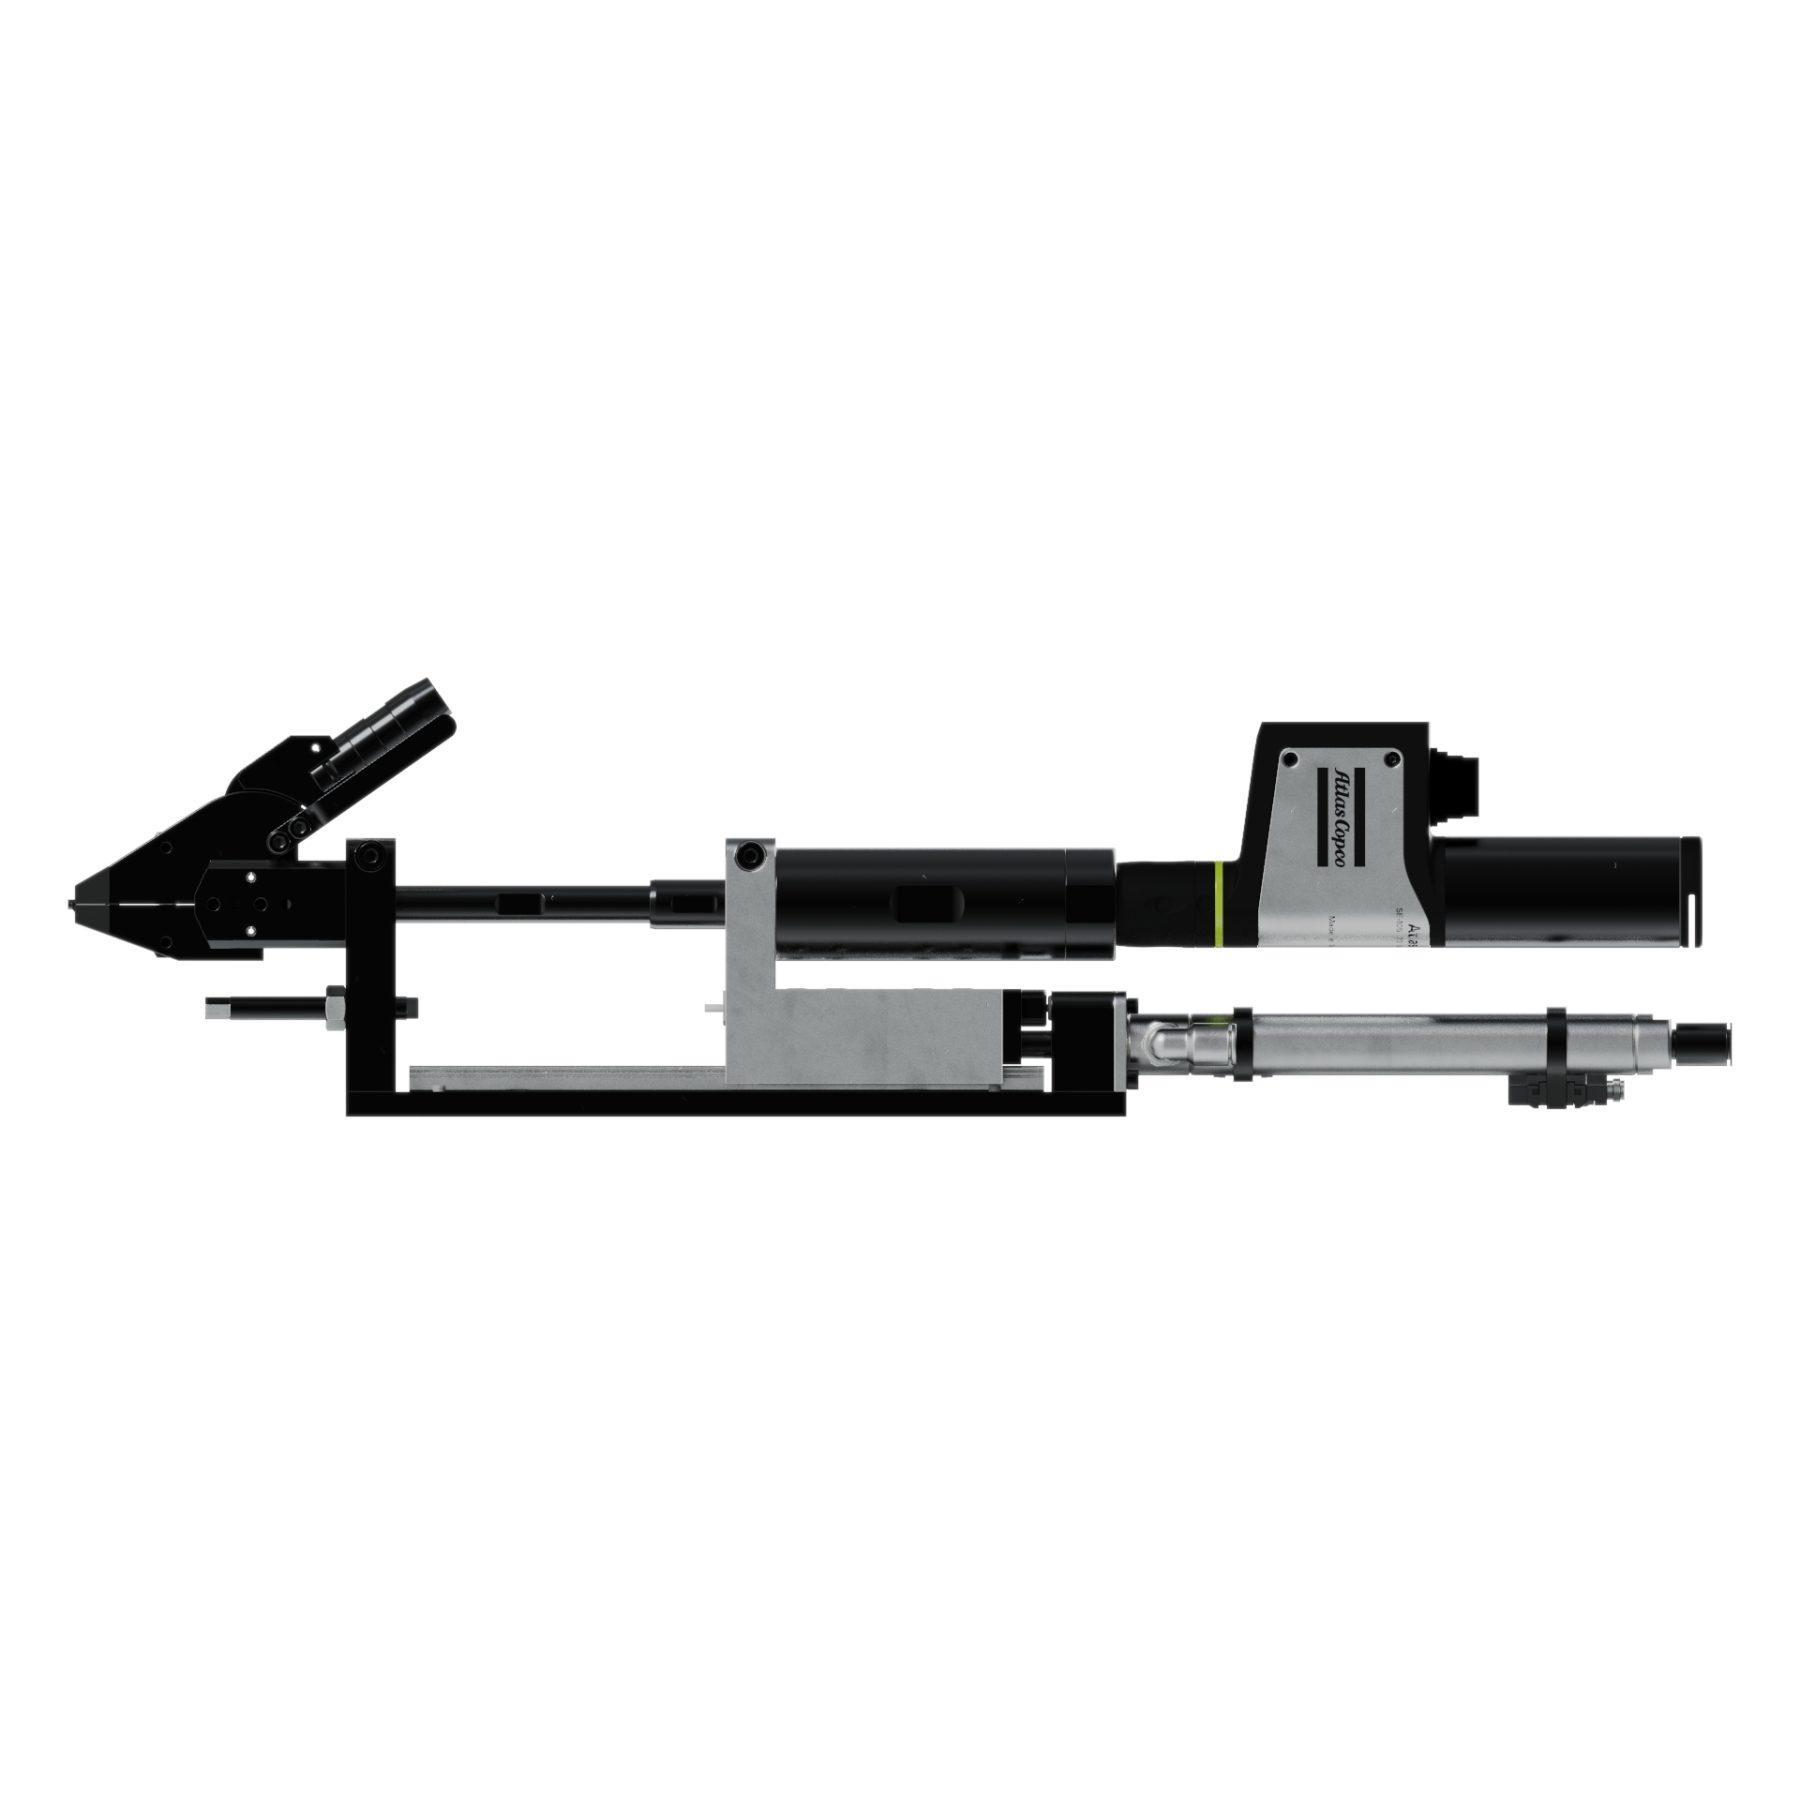 MiniMod Mini Automatic Screwdriver Head Type 6 Side 1